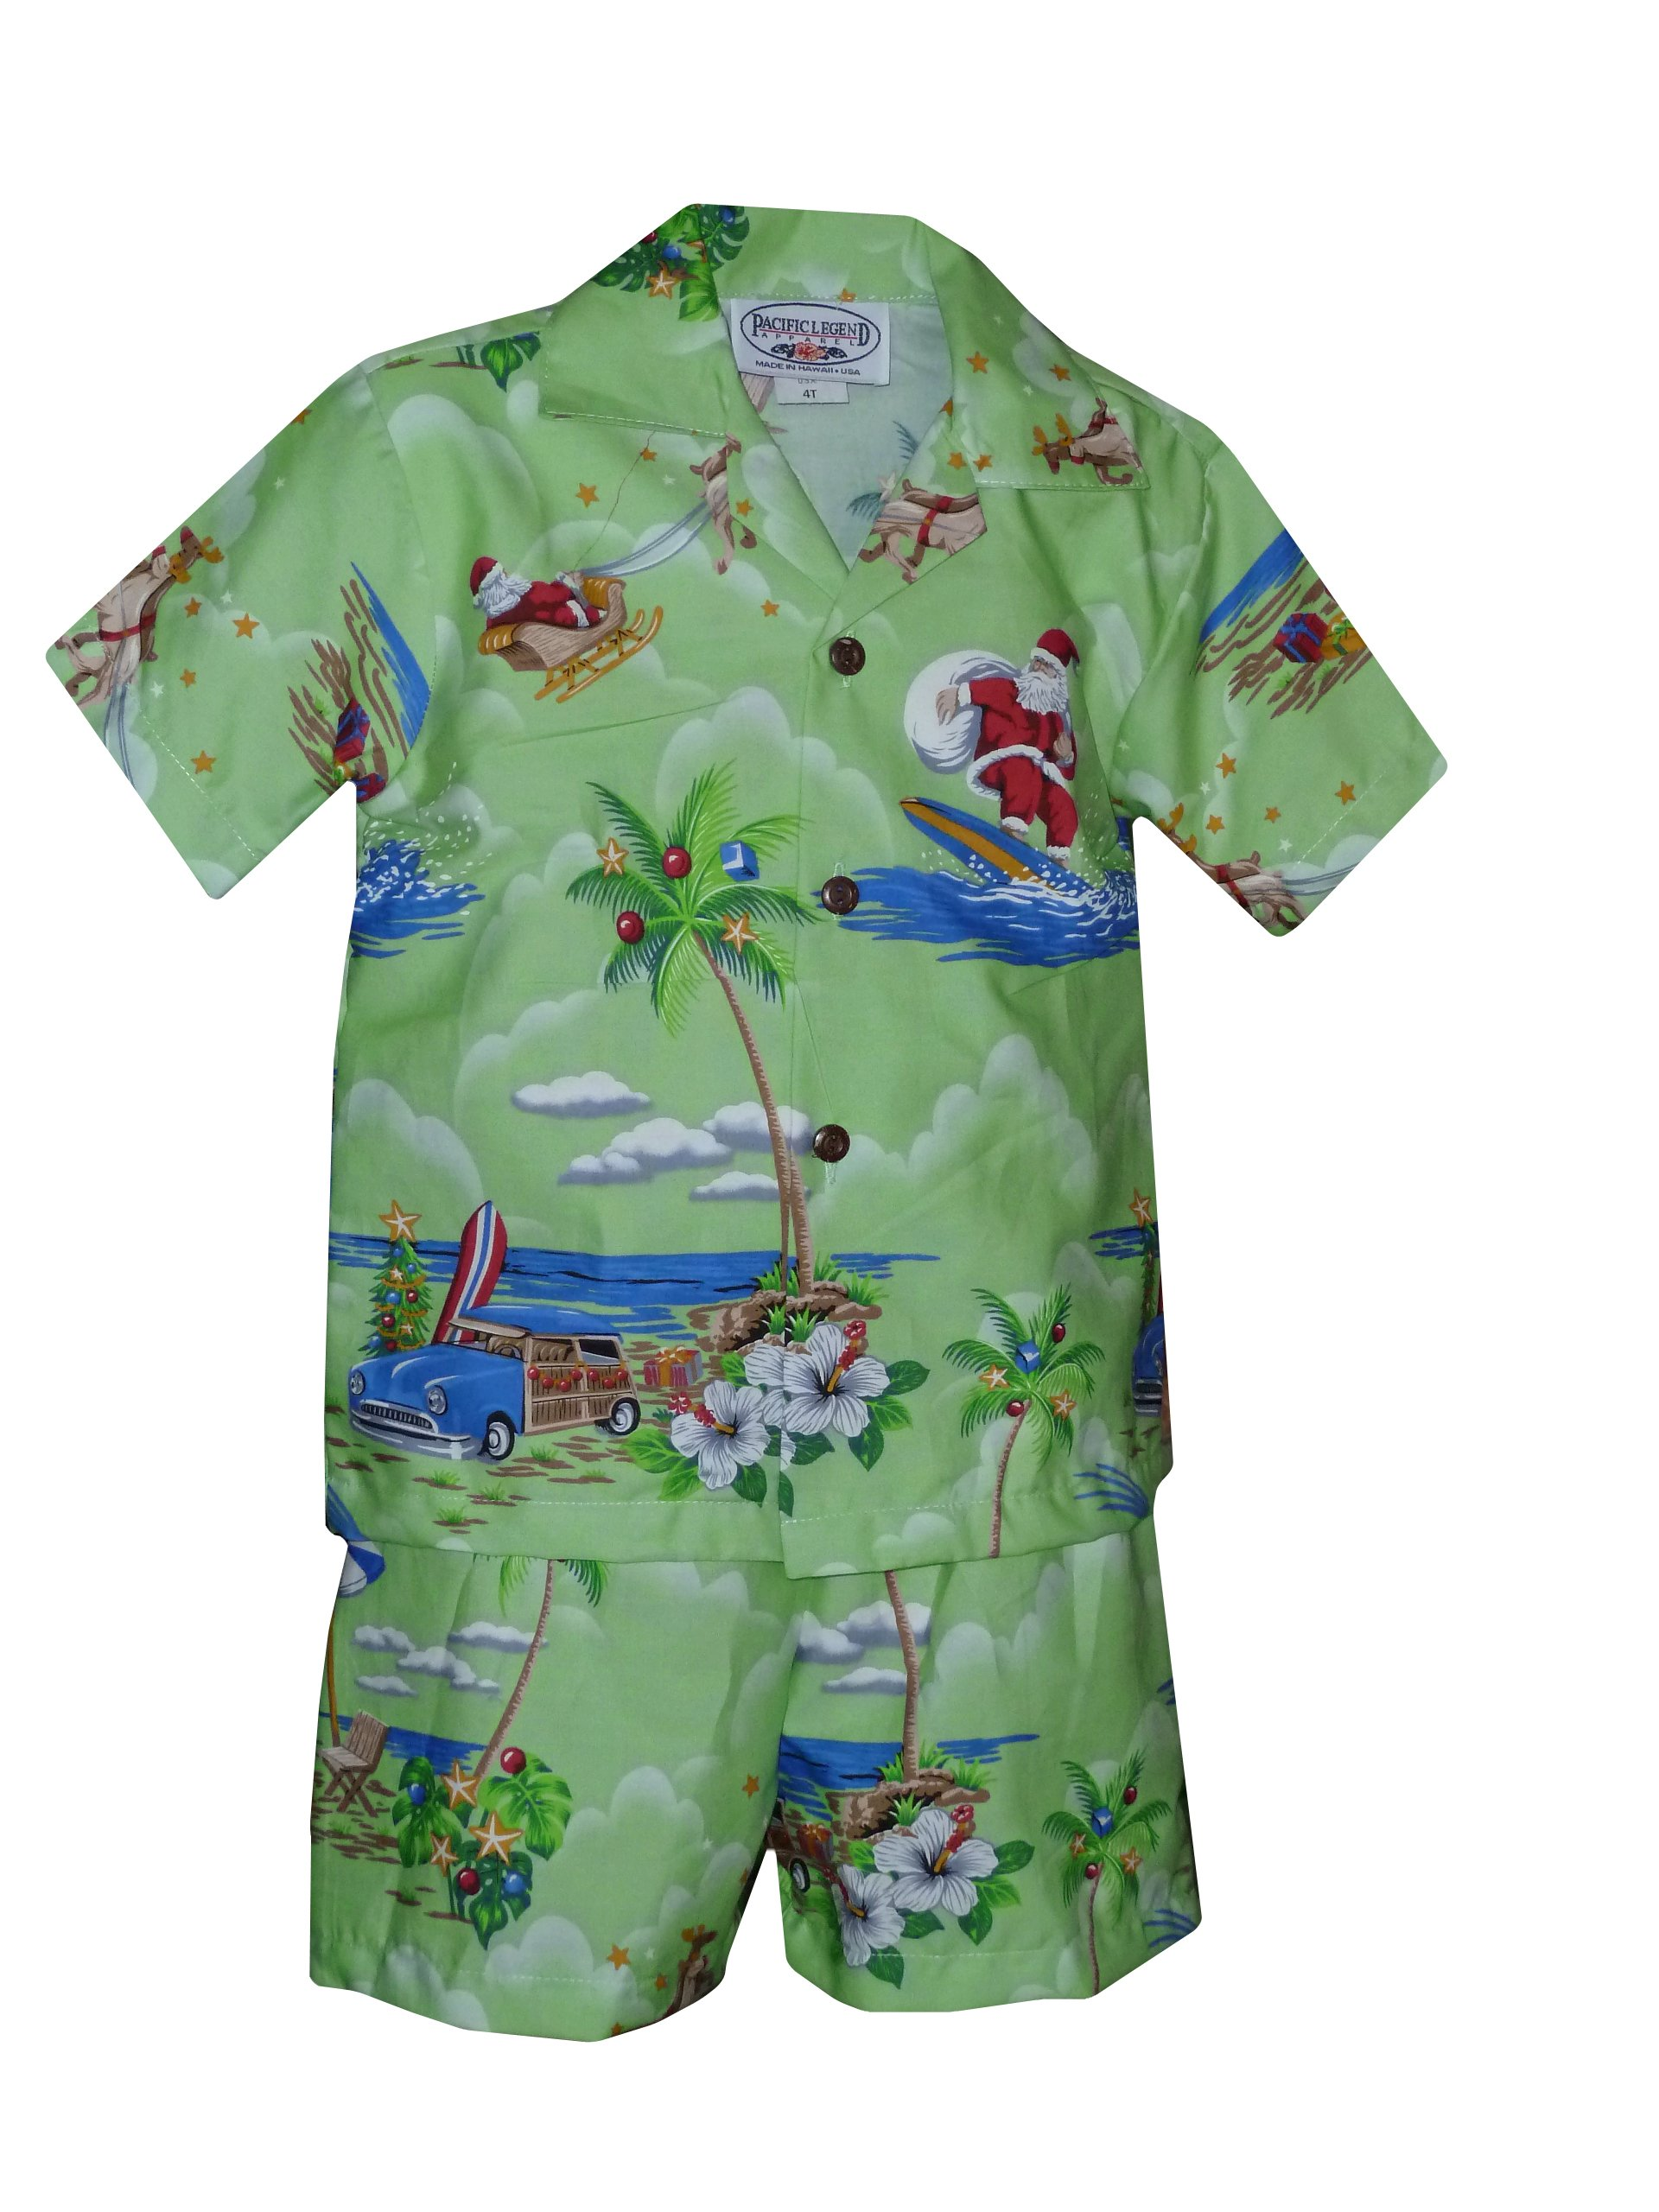 Pacific Legend Boys Santa's Xmas Hawaiian Vacation 2pc Set Green 2T for 2yrs old